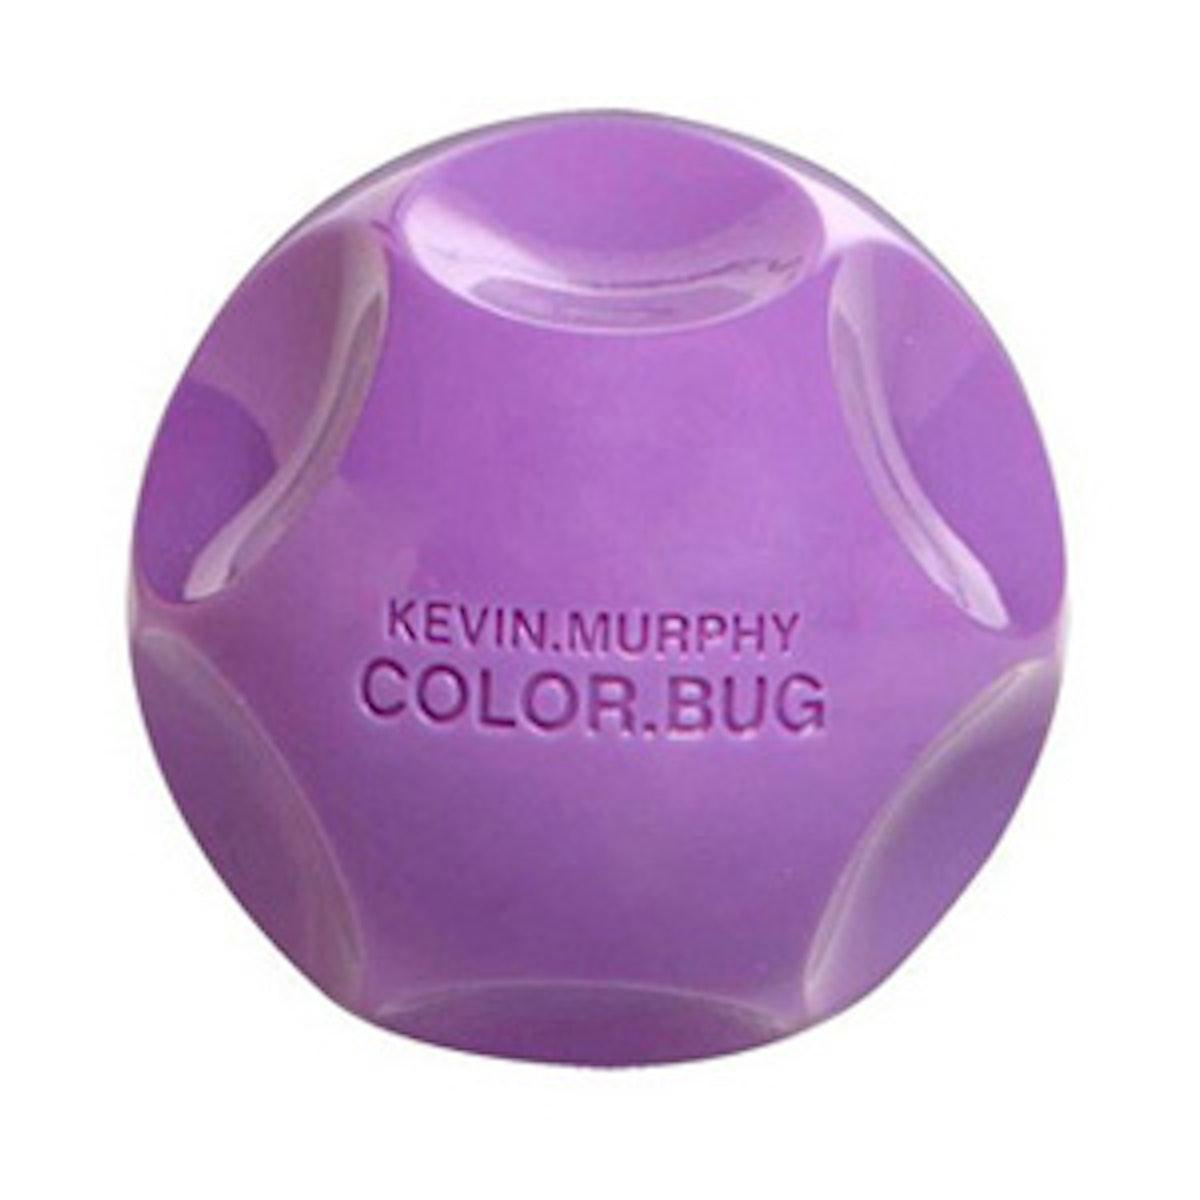 Color Bug in Purple